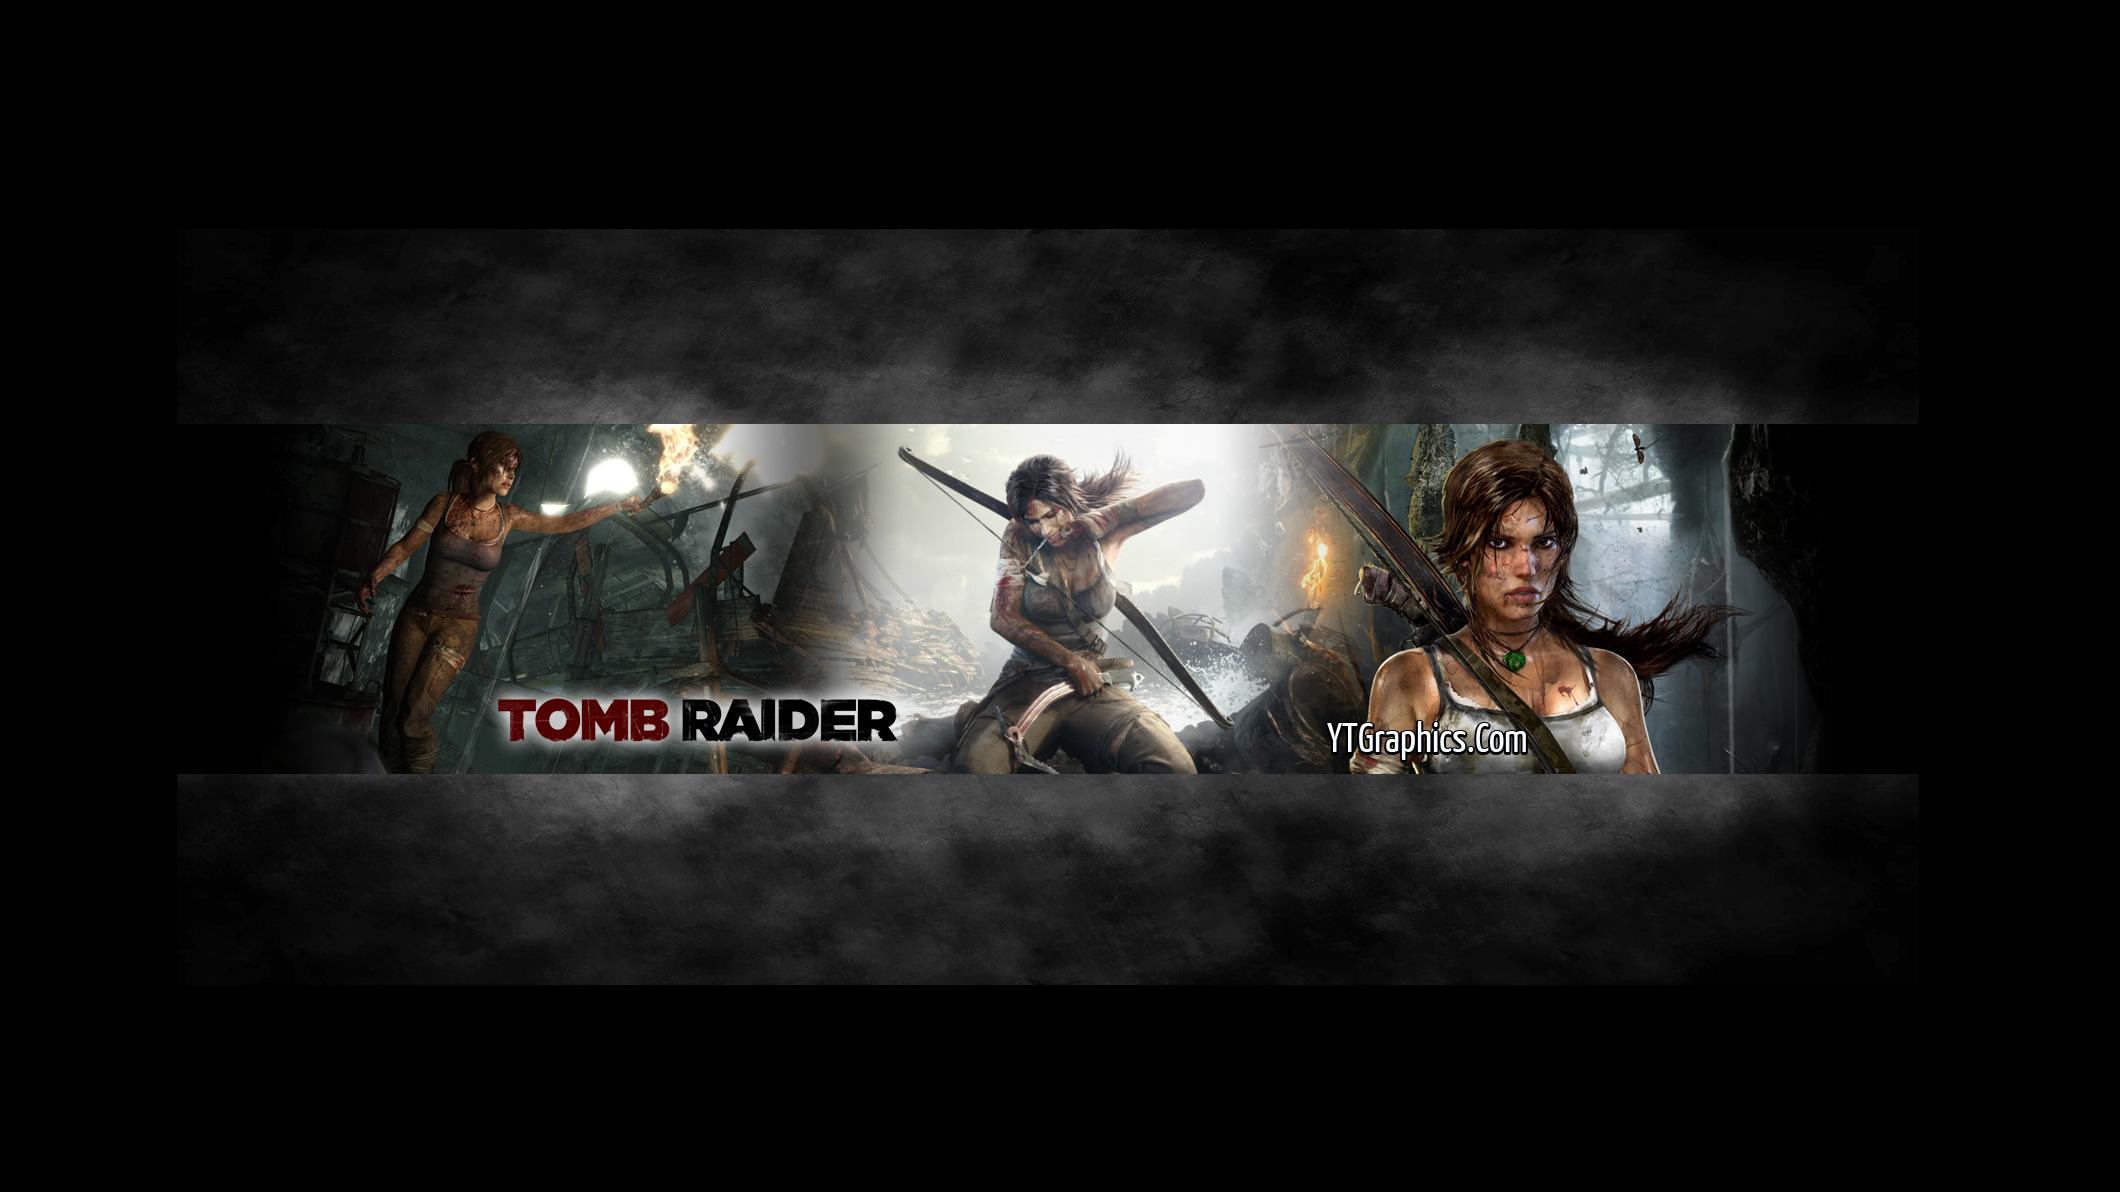 Tomb Raider YouTube Channel Art Banner